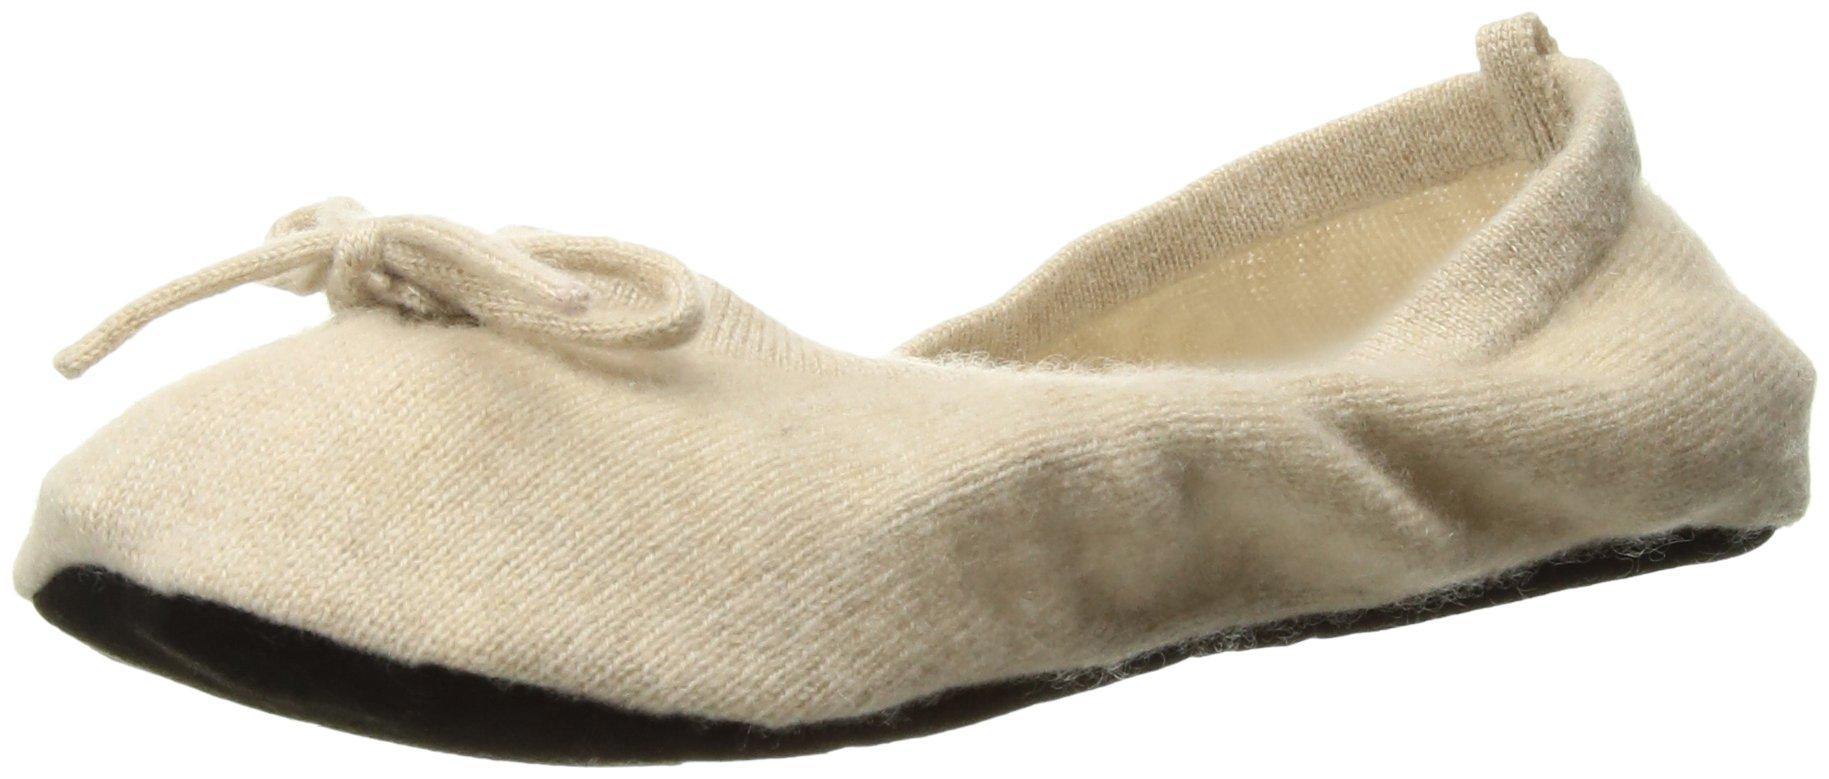 Sofia Cashmere Women's Cashmere Travel Set - Ballet Slippers, oatmeal + ivory, Small / Medium